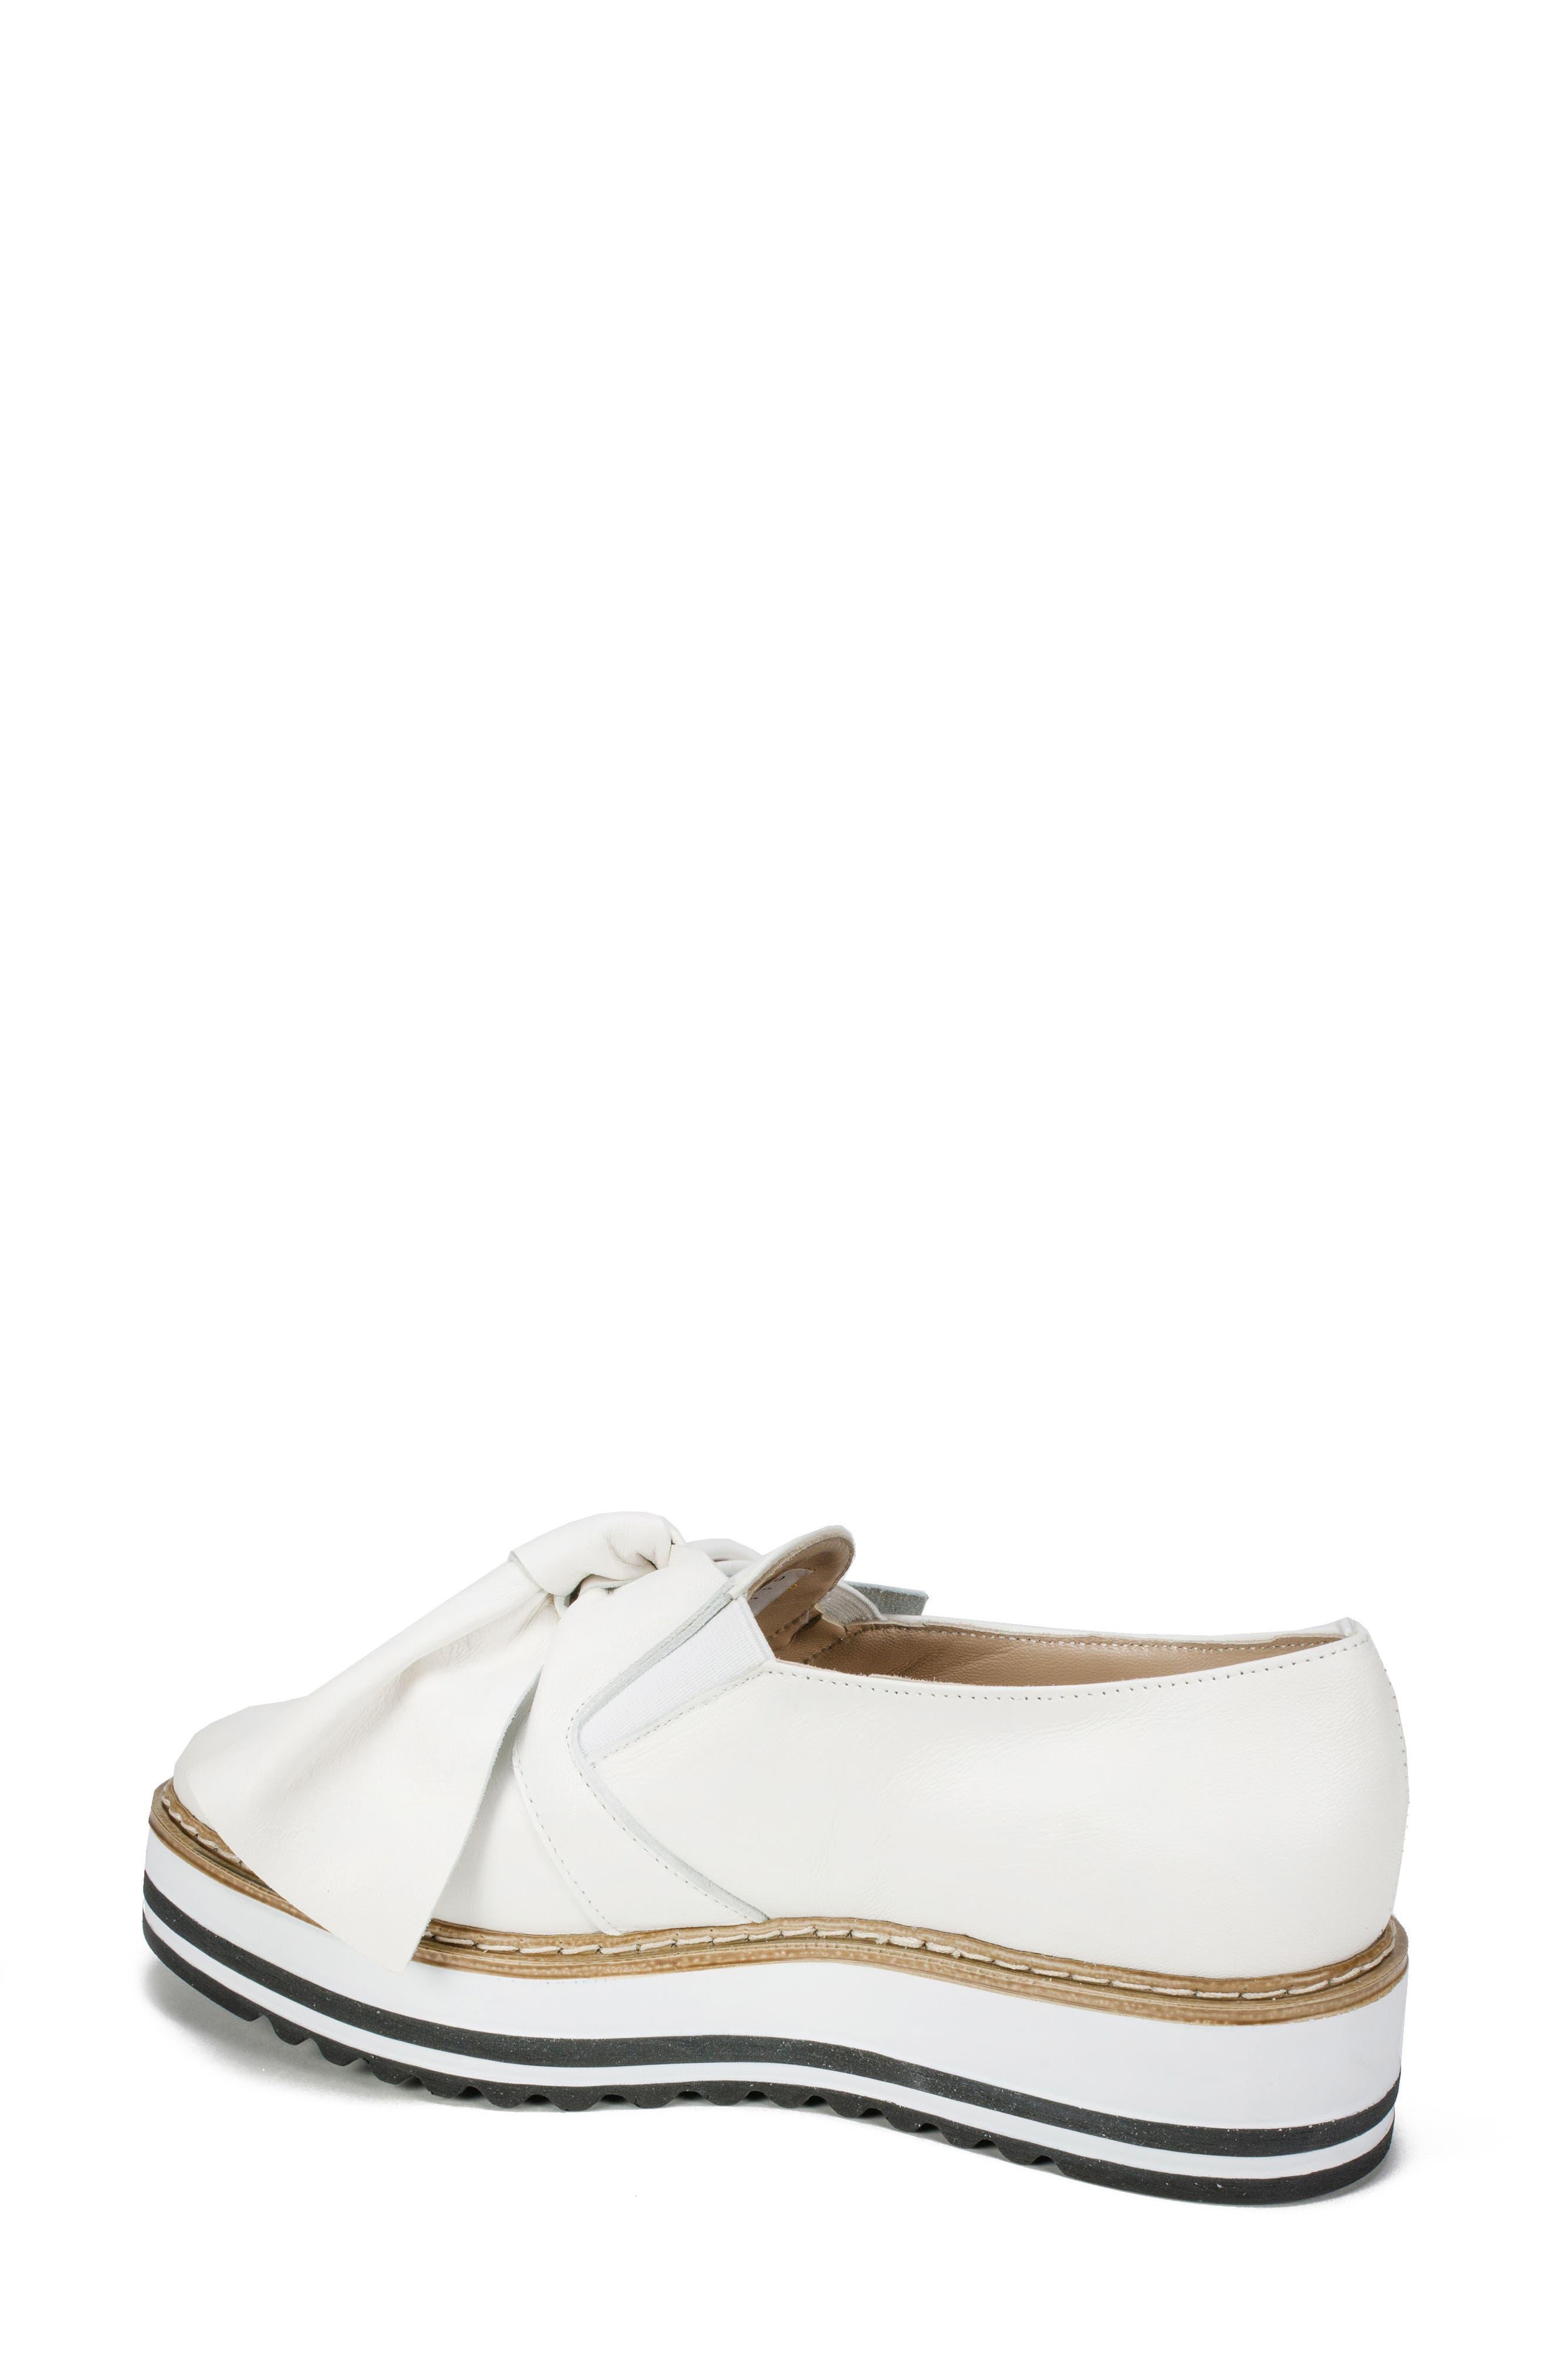 Bella Platform Loafer,                             Alternate thumbnail 2, color,                             WHITE LEATHER